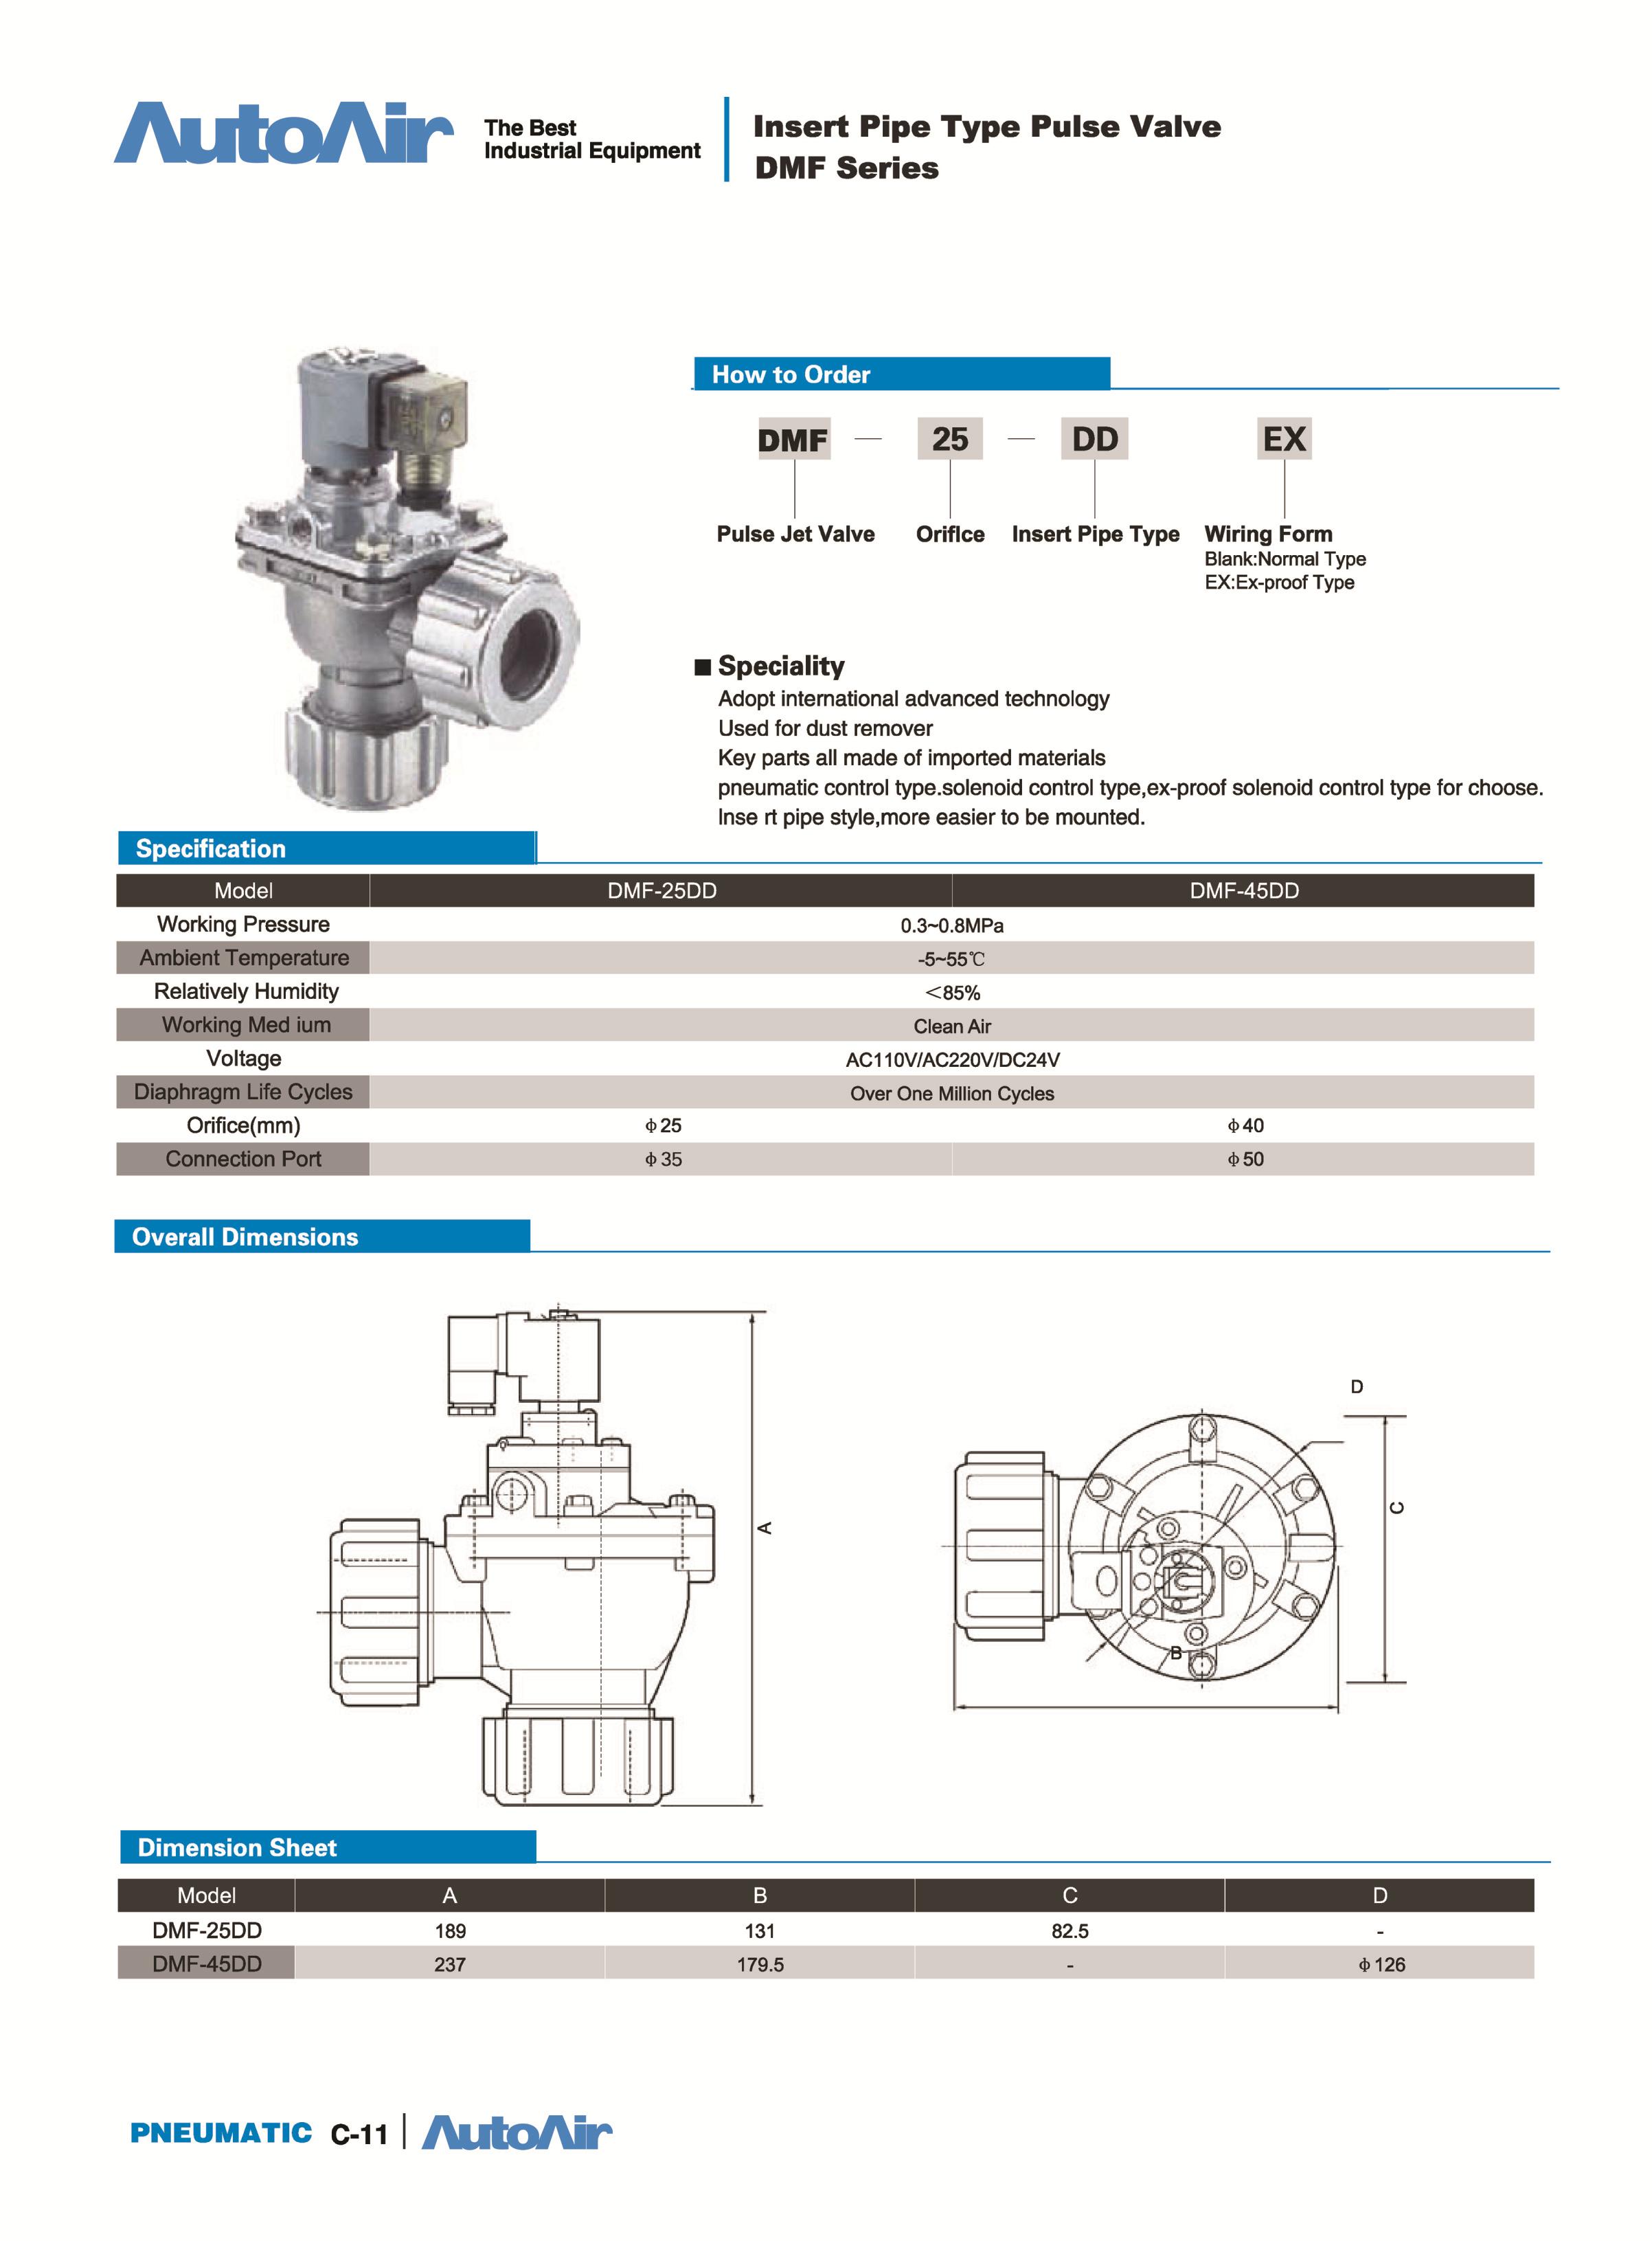 water valve(11)